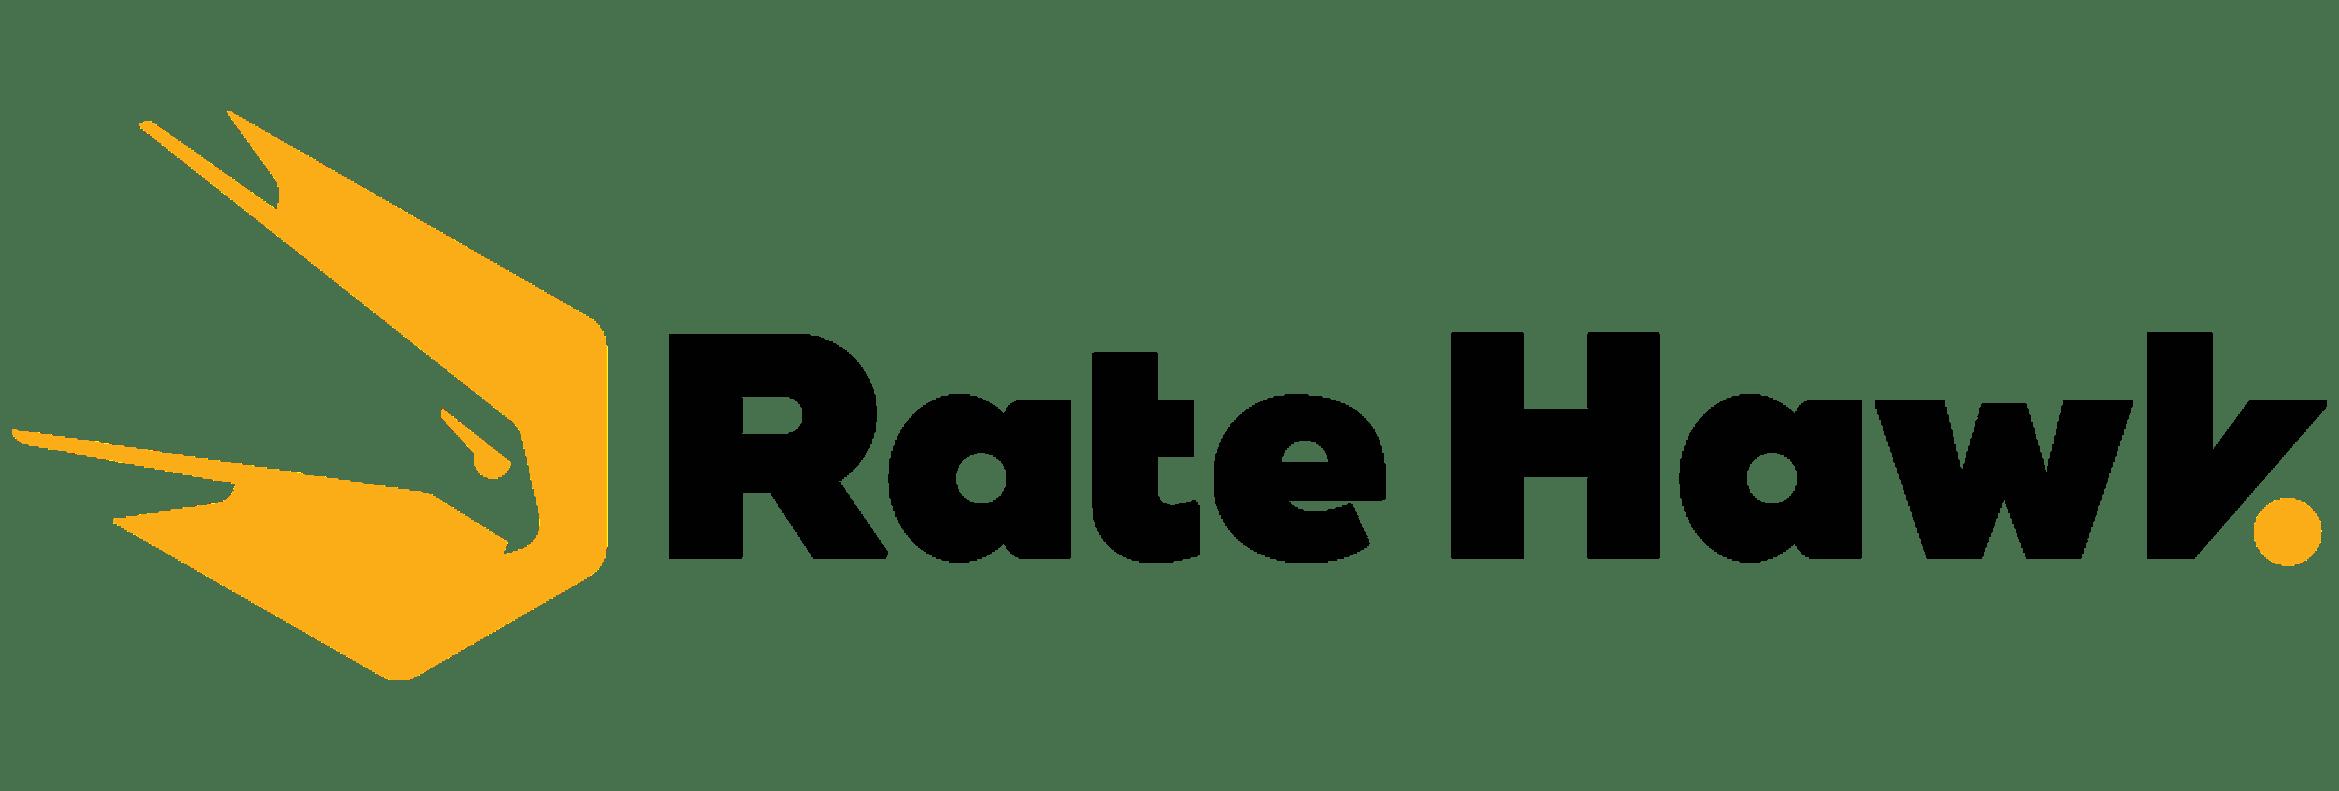 gekko-group-infinite-logo-rate-hawk